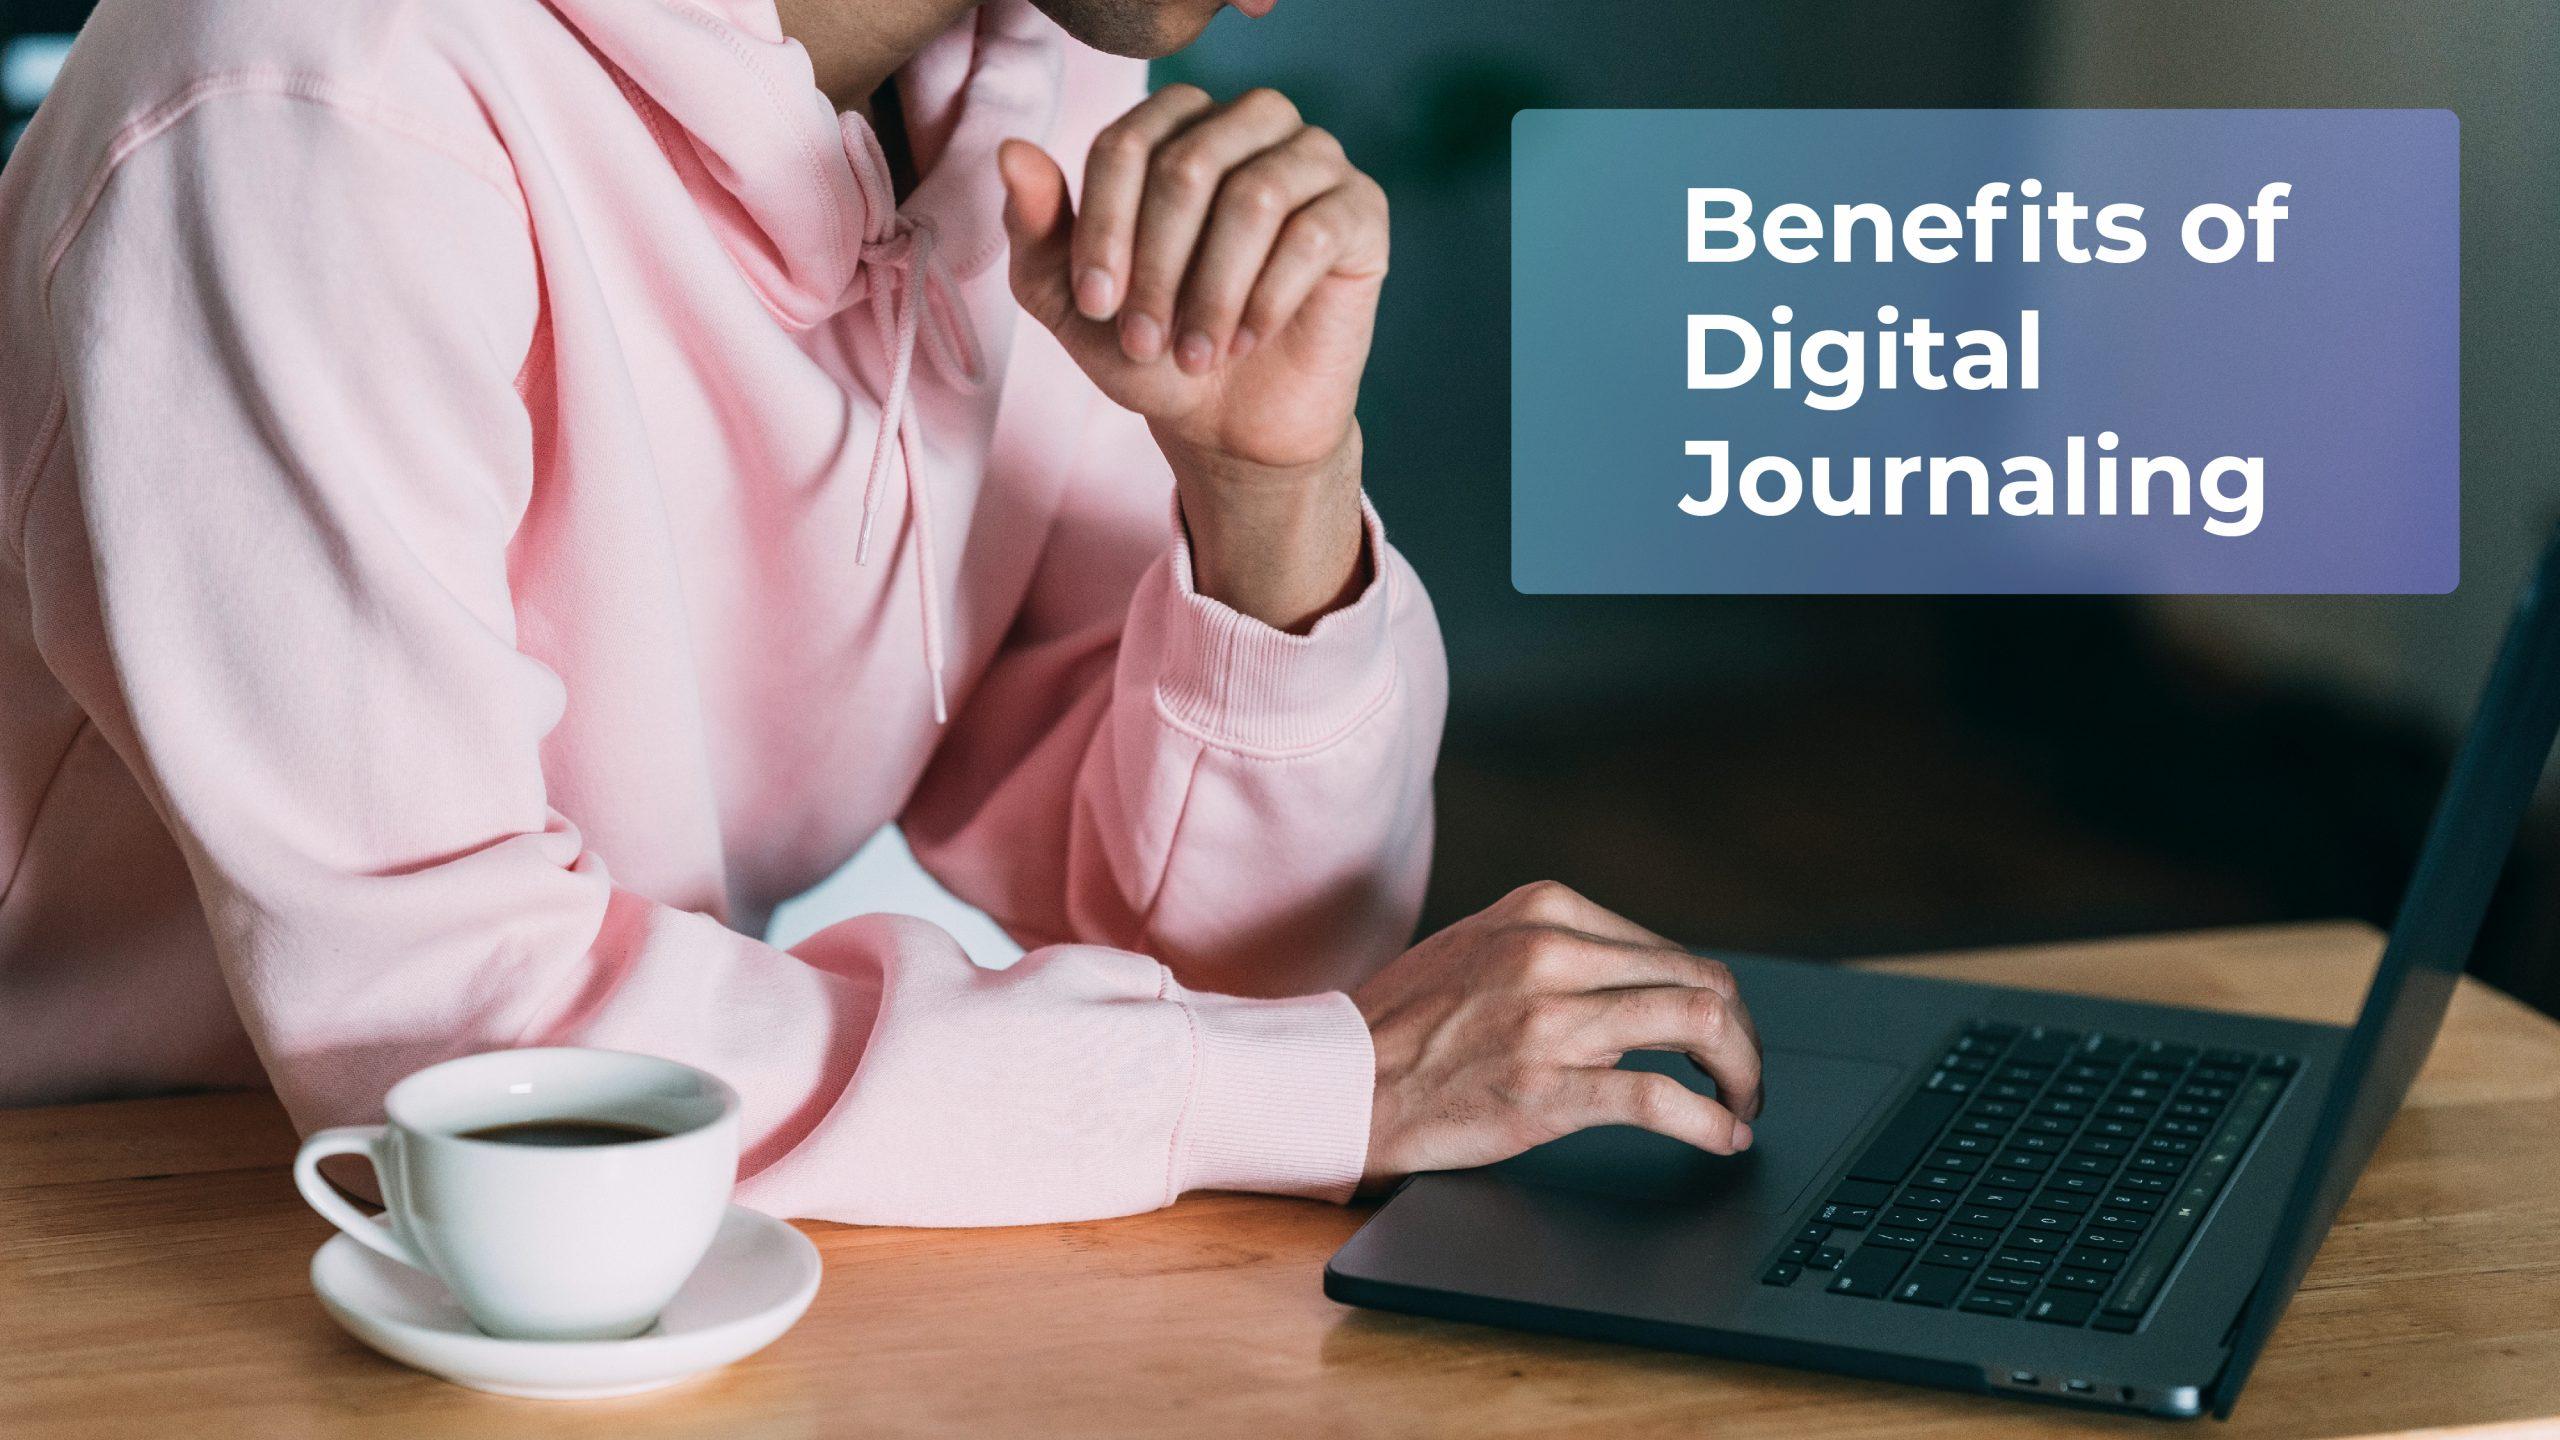 benefits of digital journaling blog image